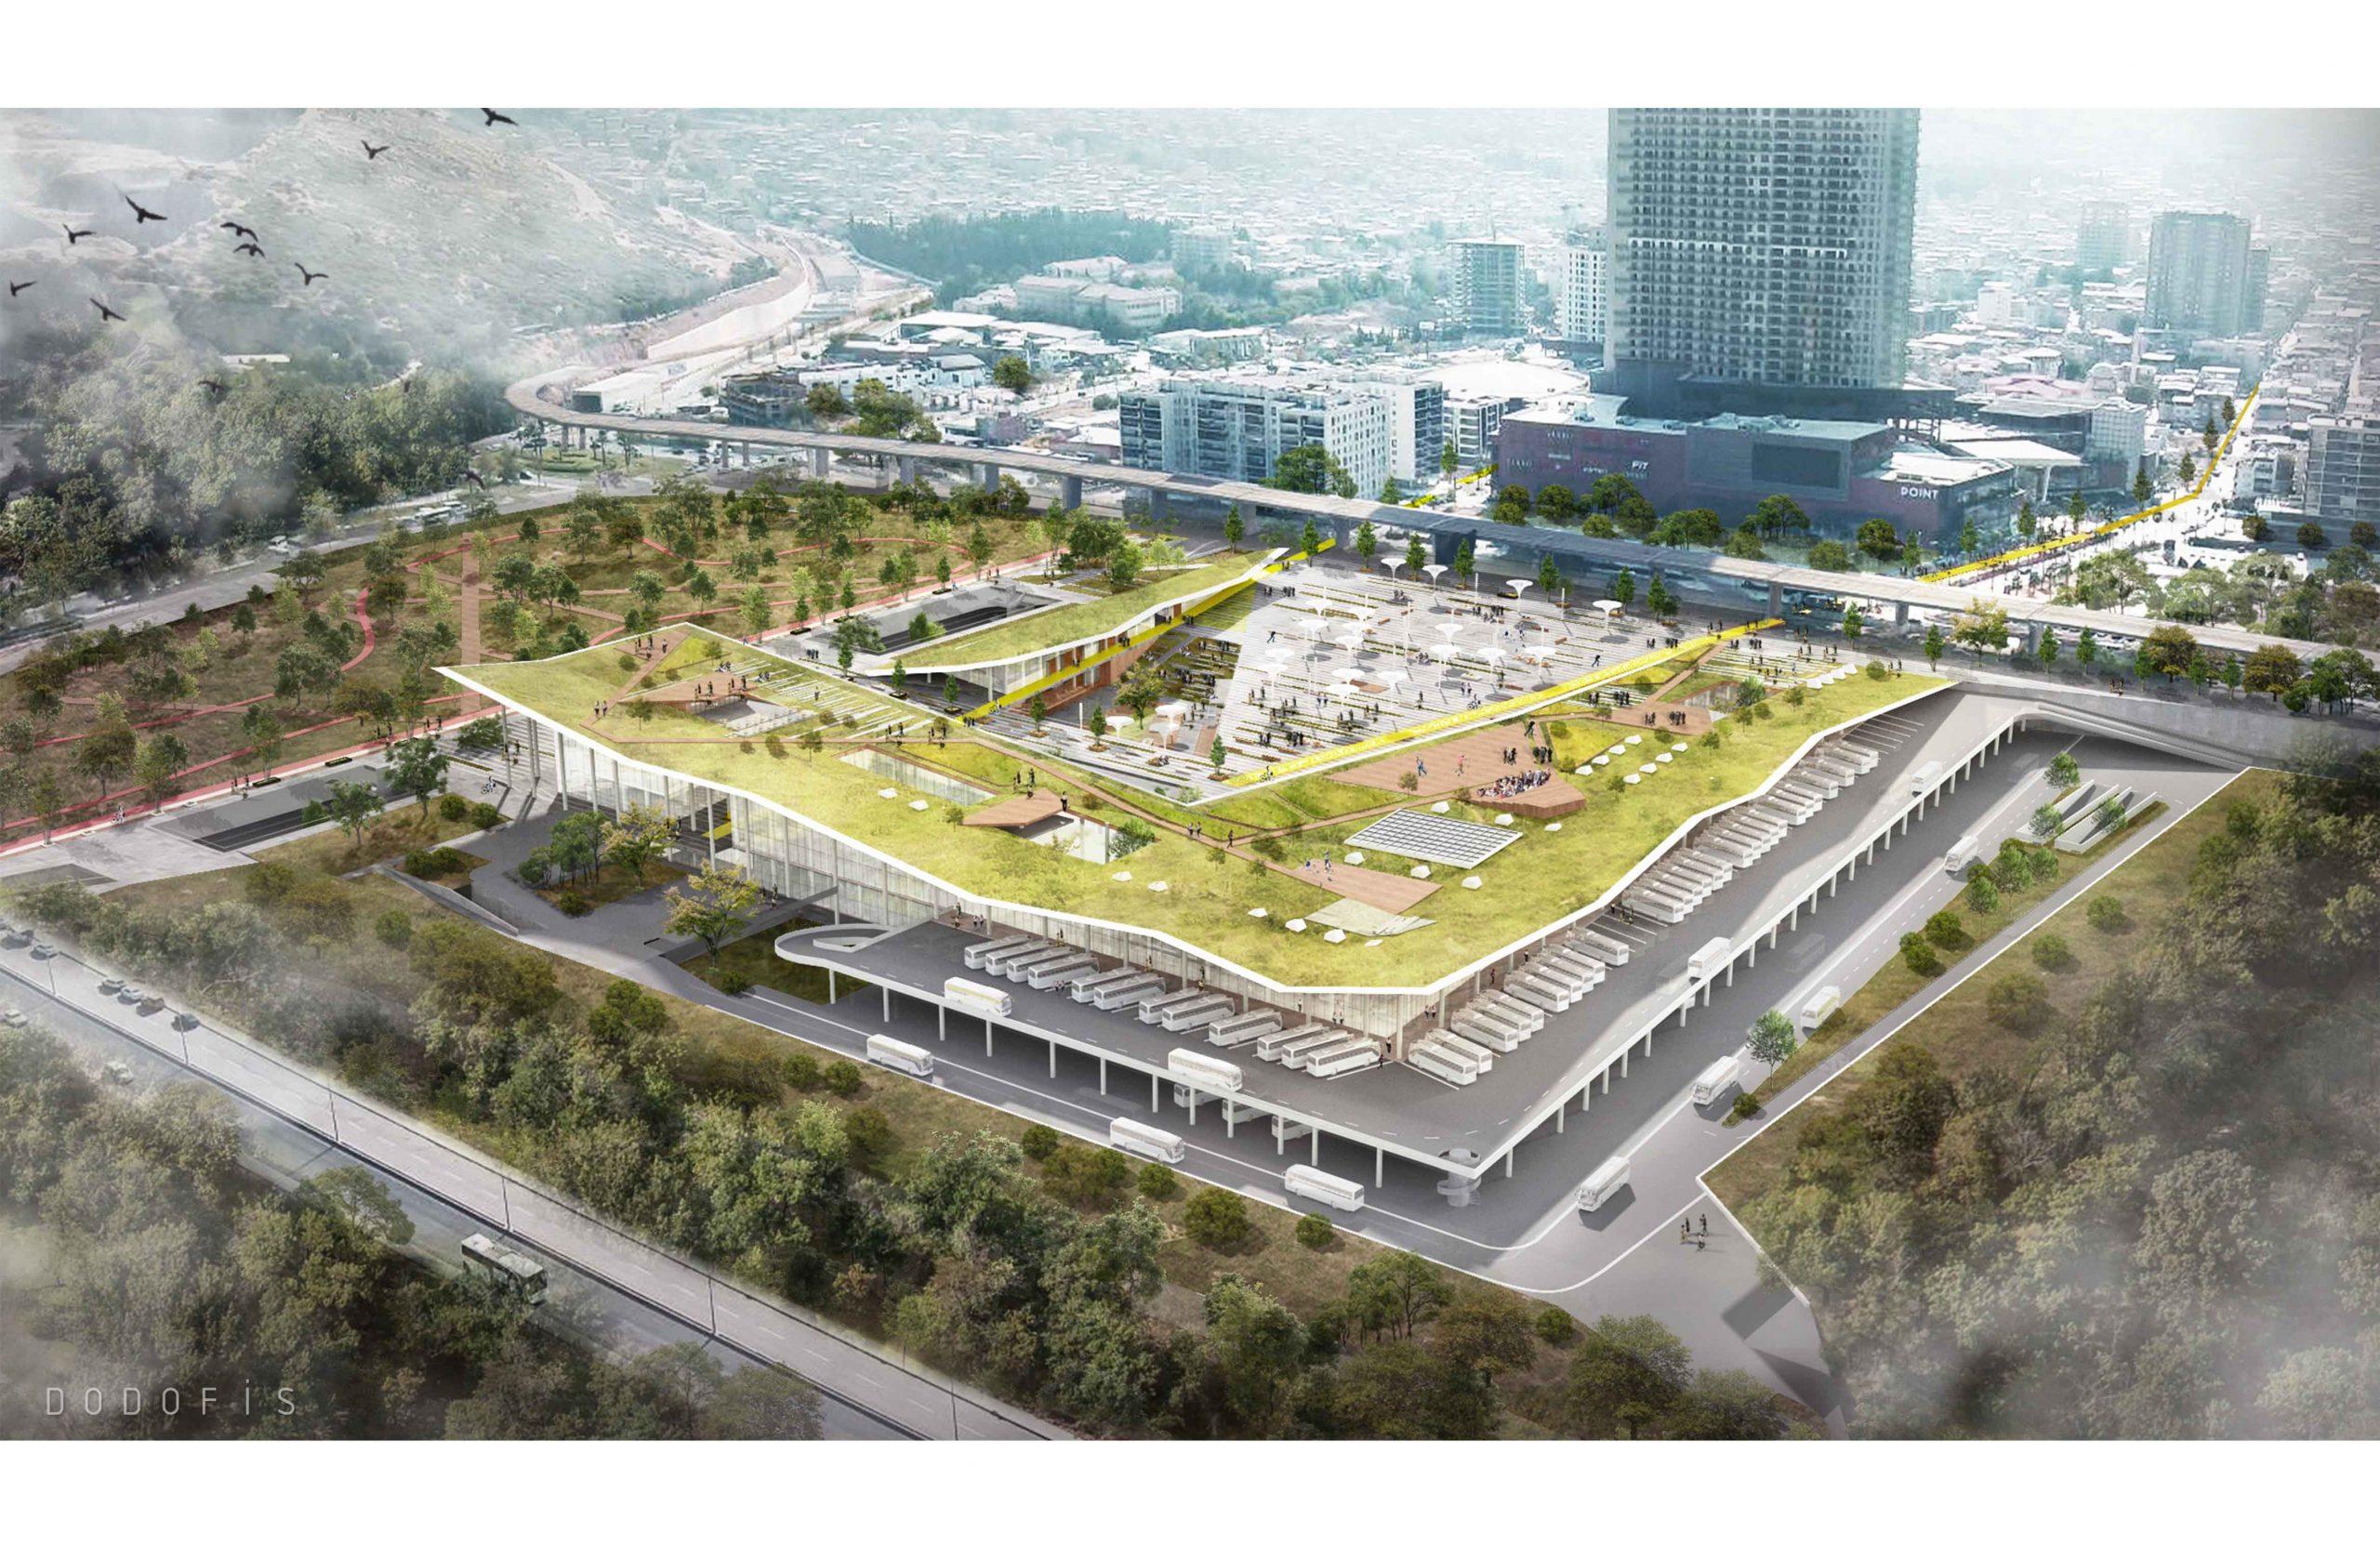 dodofis mimarlık izmir otogarı ana tranfer merkezi